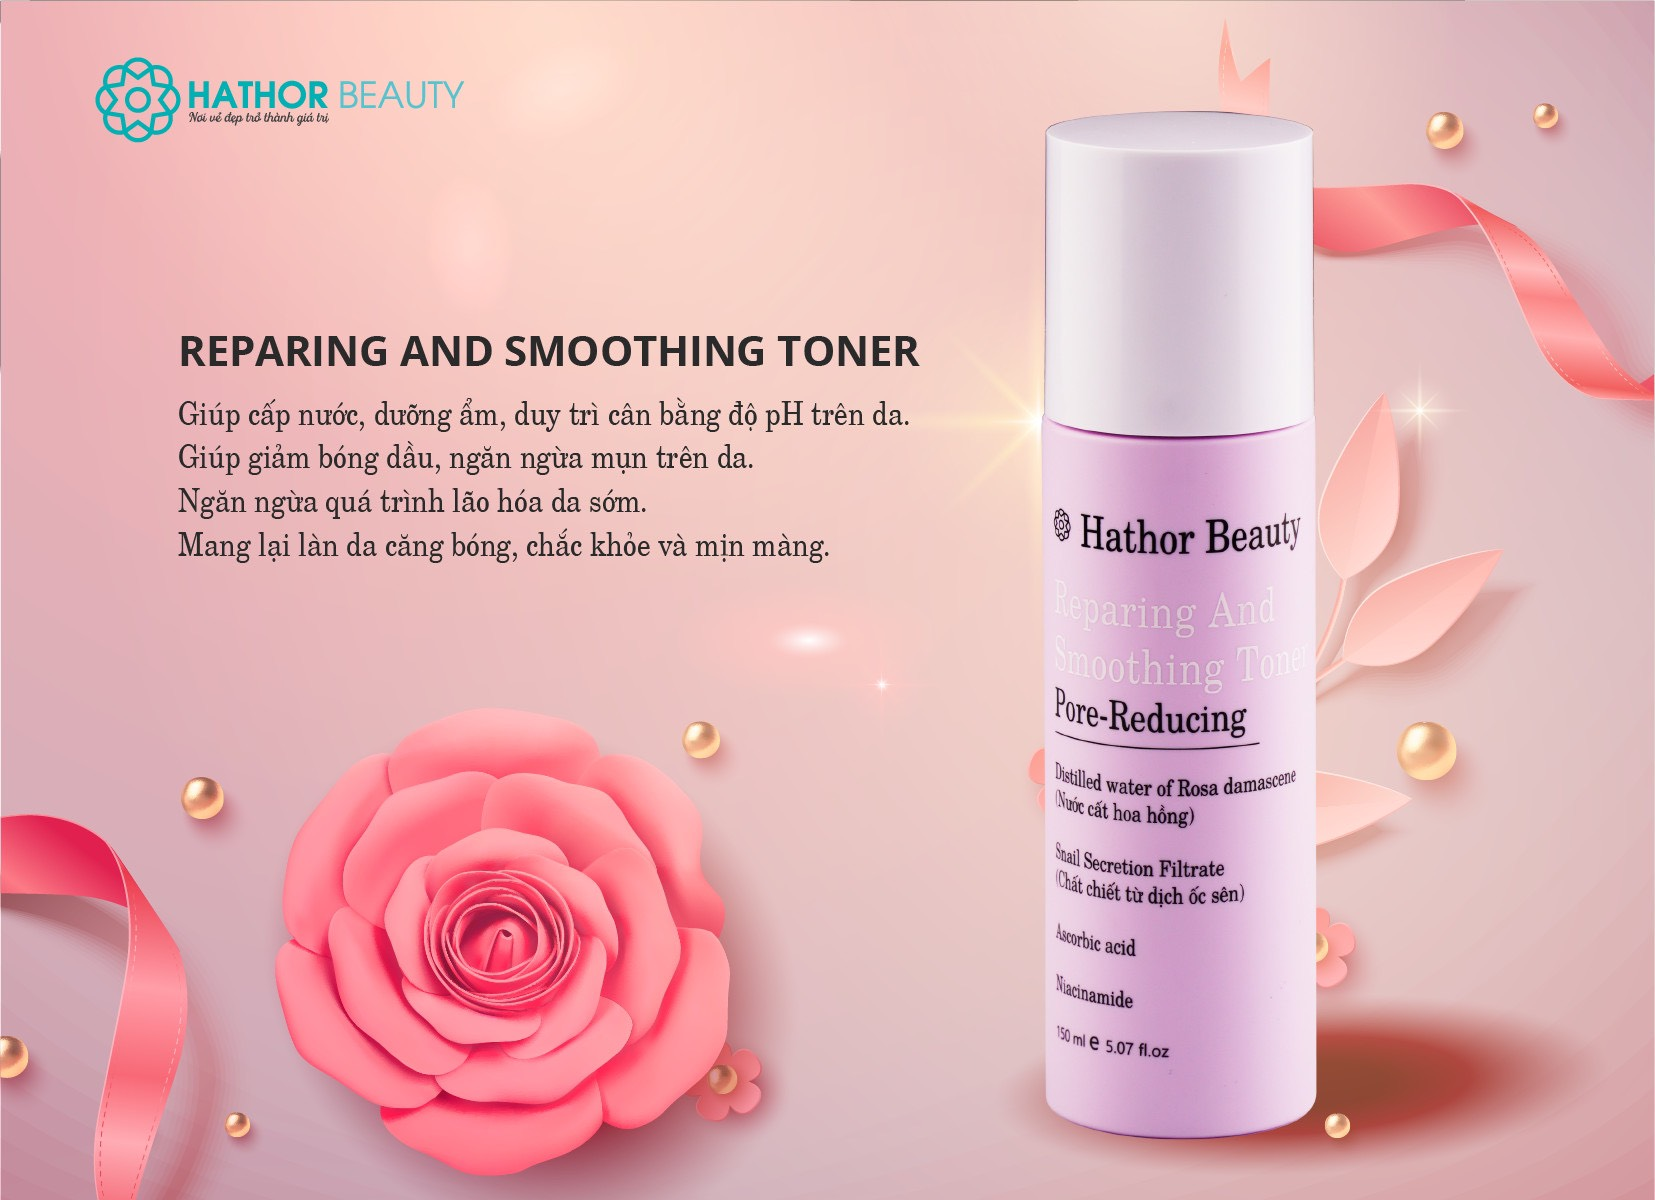 Reparing And Smoothing Toner Hathor Beauty 150ml